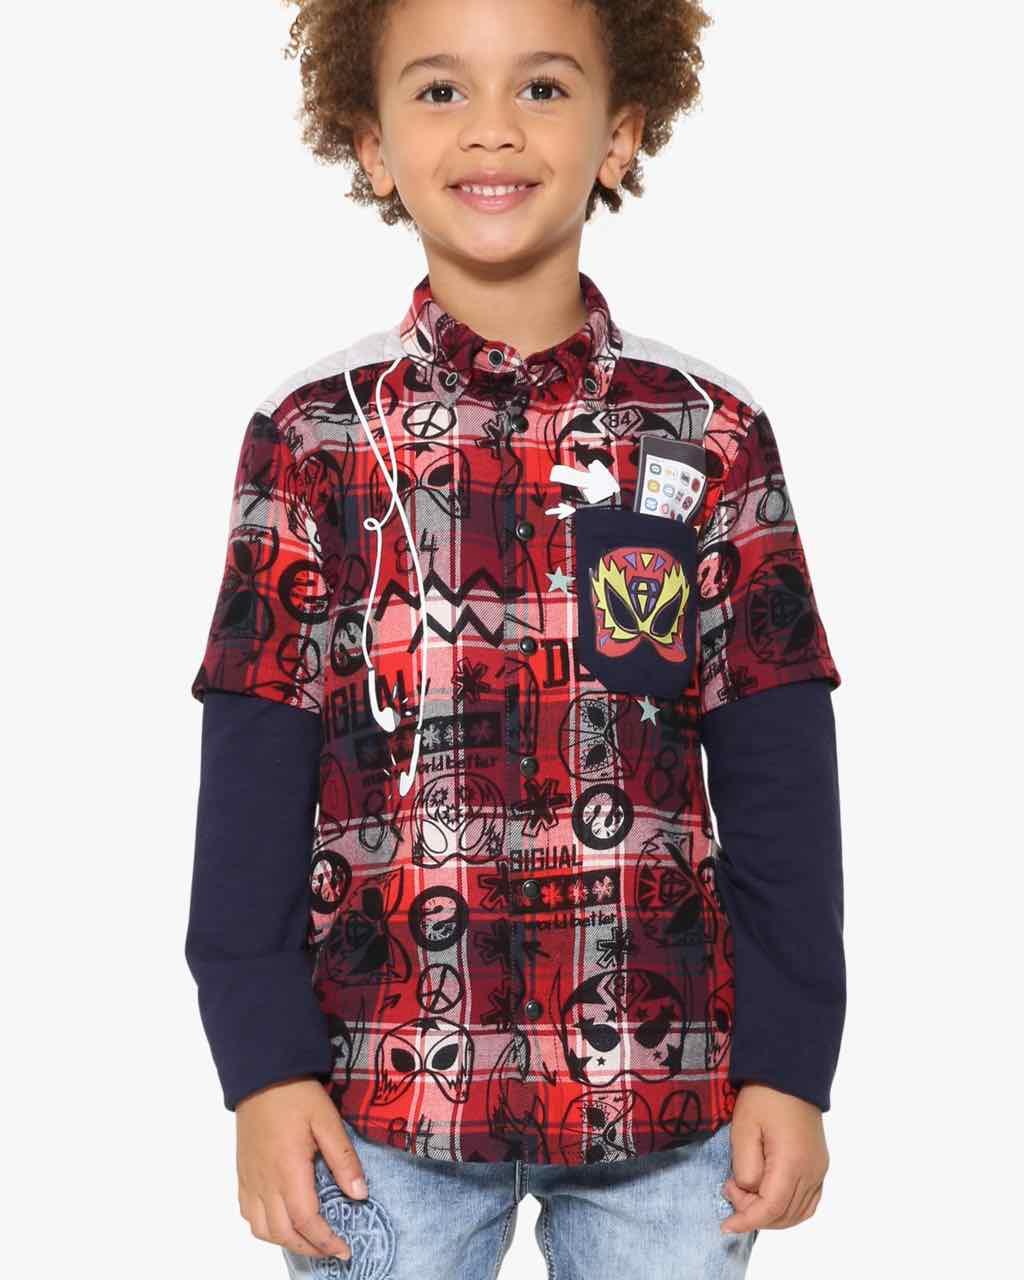 17WBCW01_3092 Desigual Boys Shirt Chow Buy Online